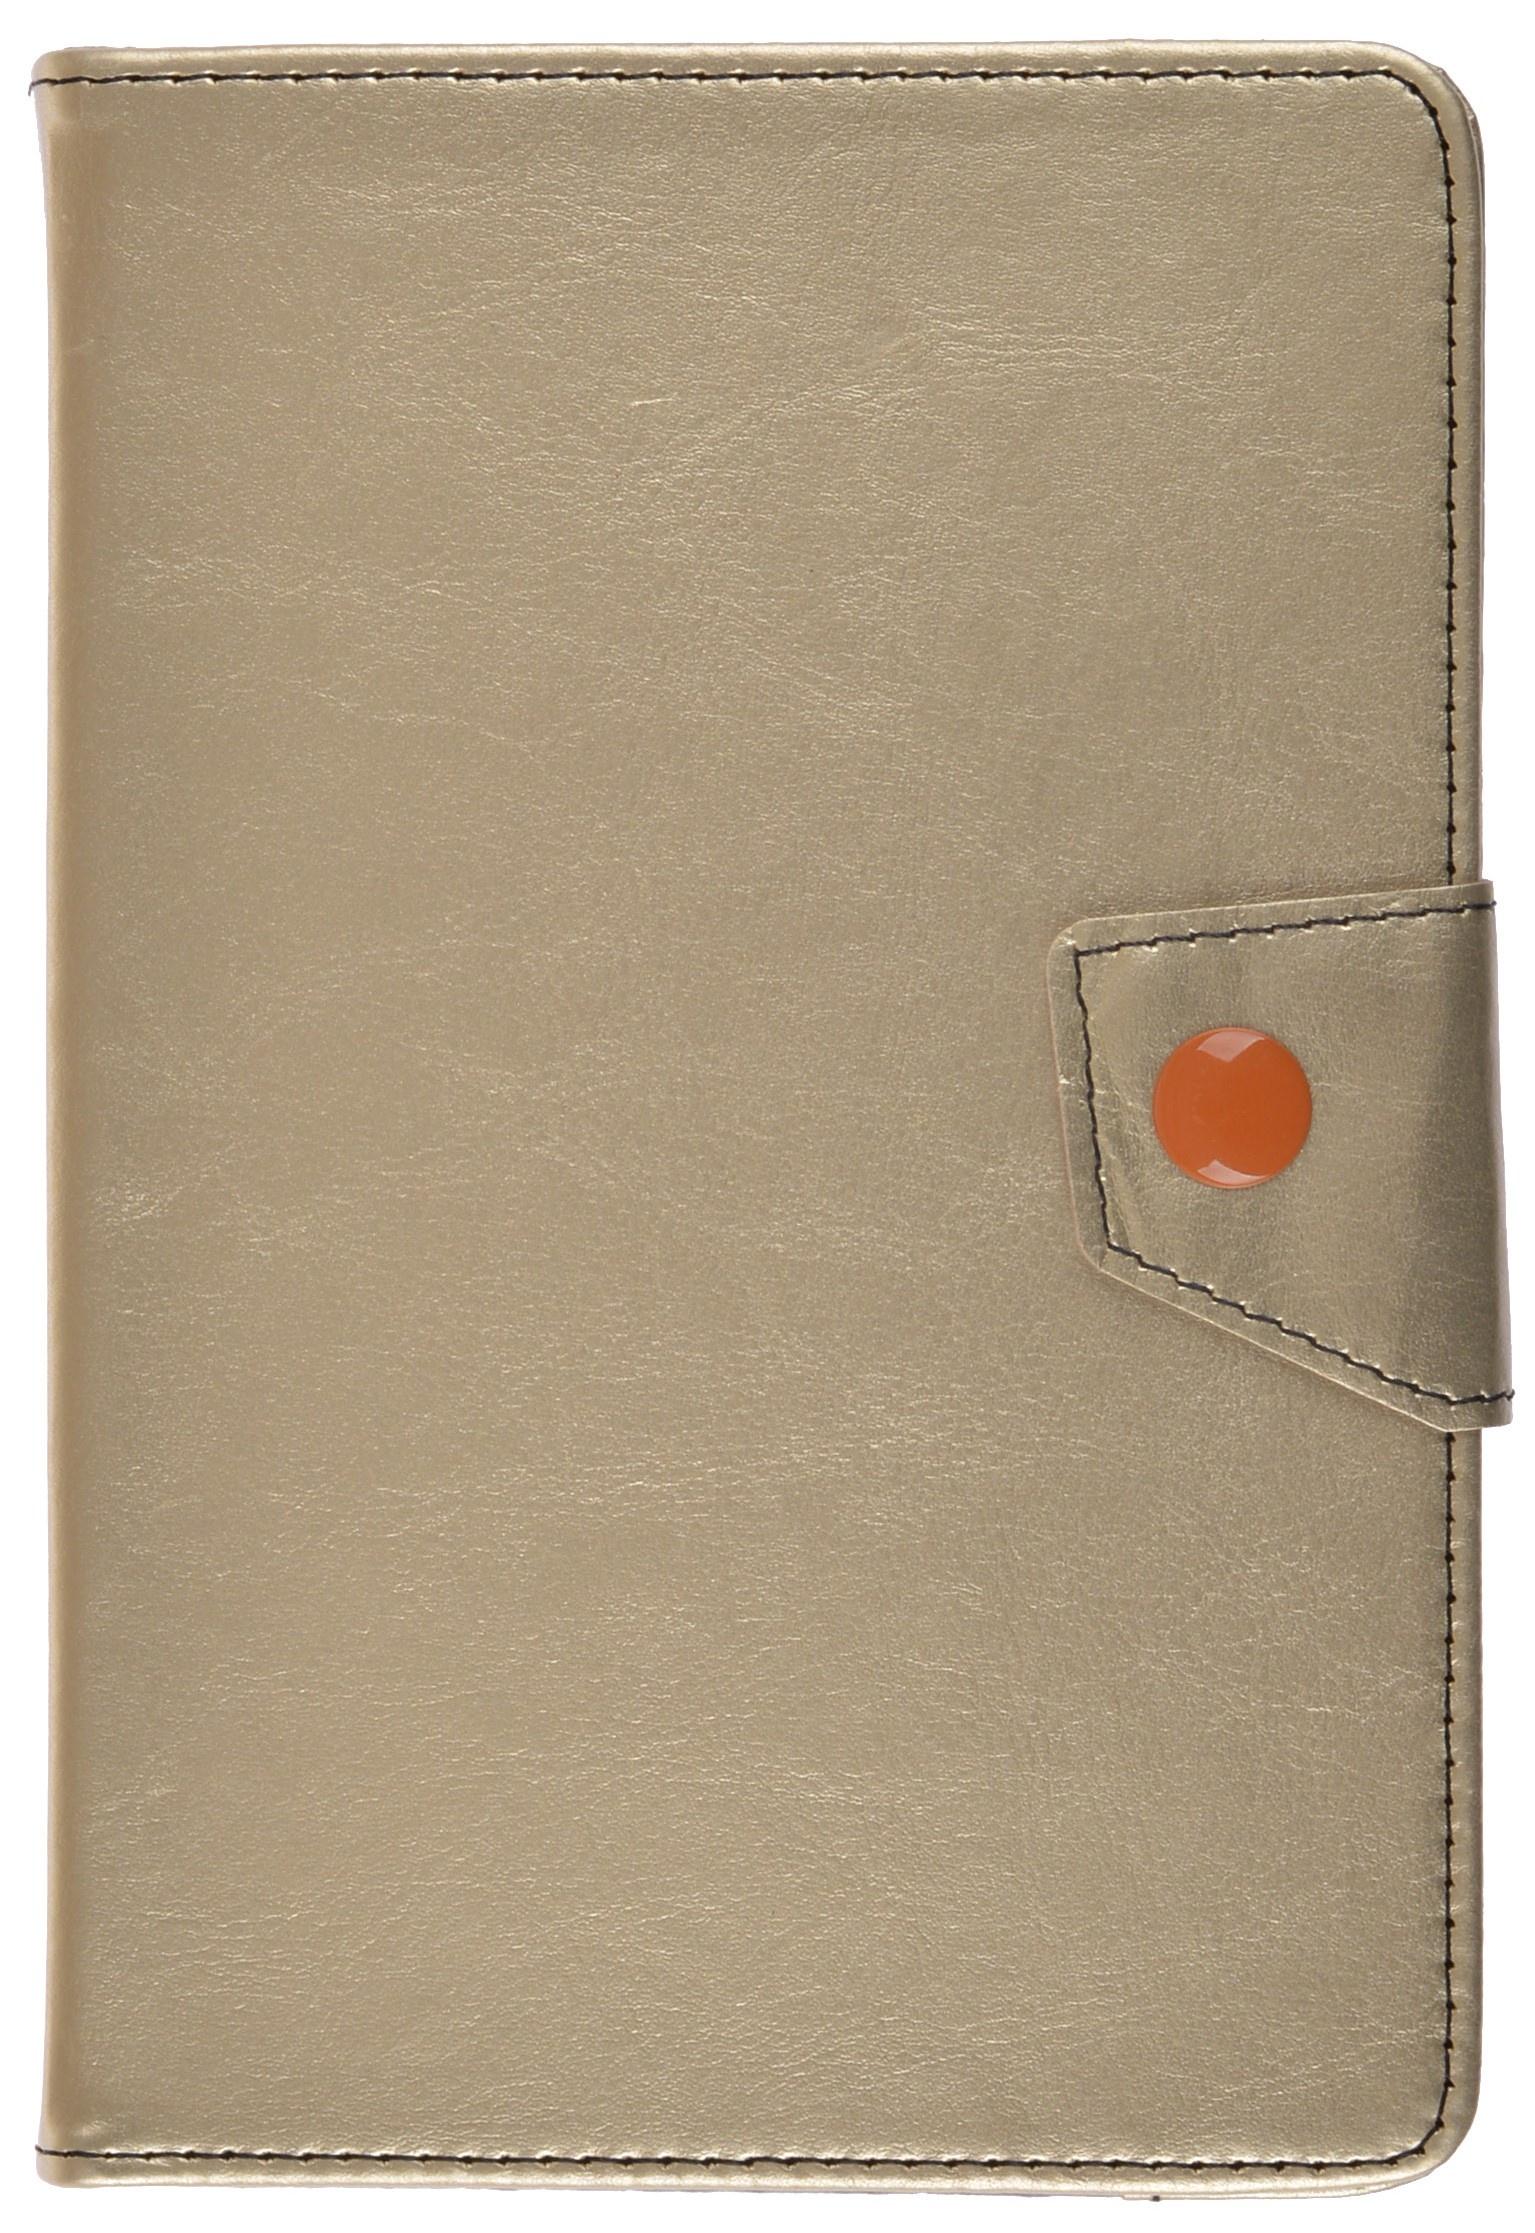 Чехол для планшета ProShield Standard slim clips7, 4660041409550, золотой